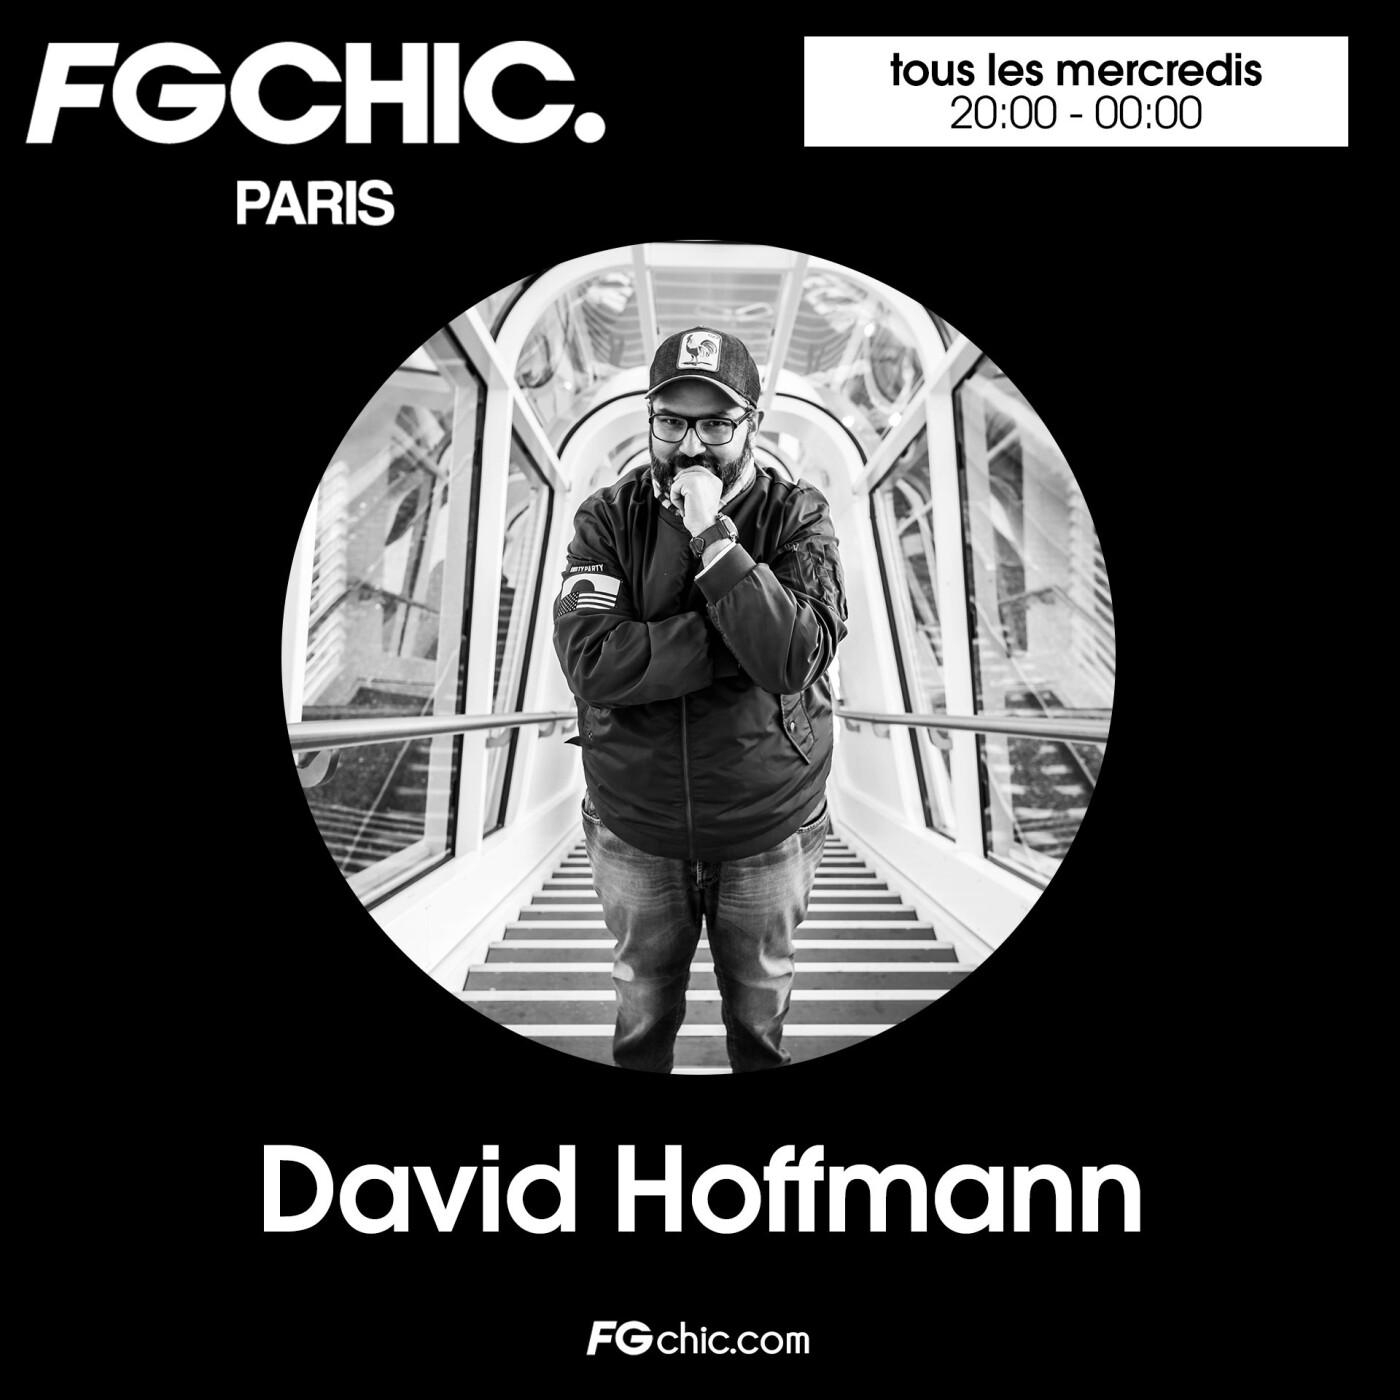 FG CHIC MIX BY DAVID HOFFMANN